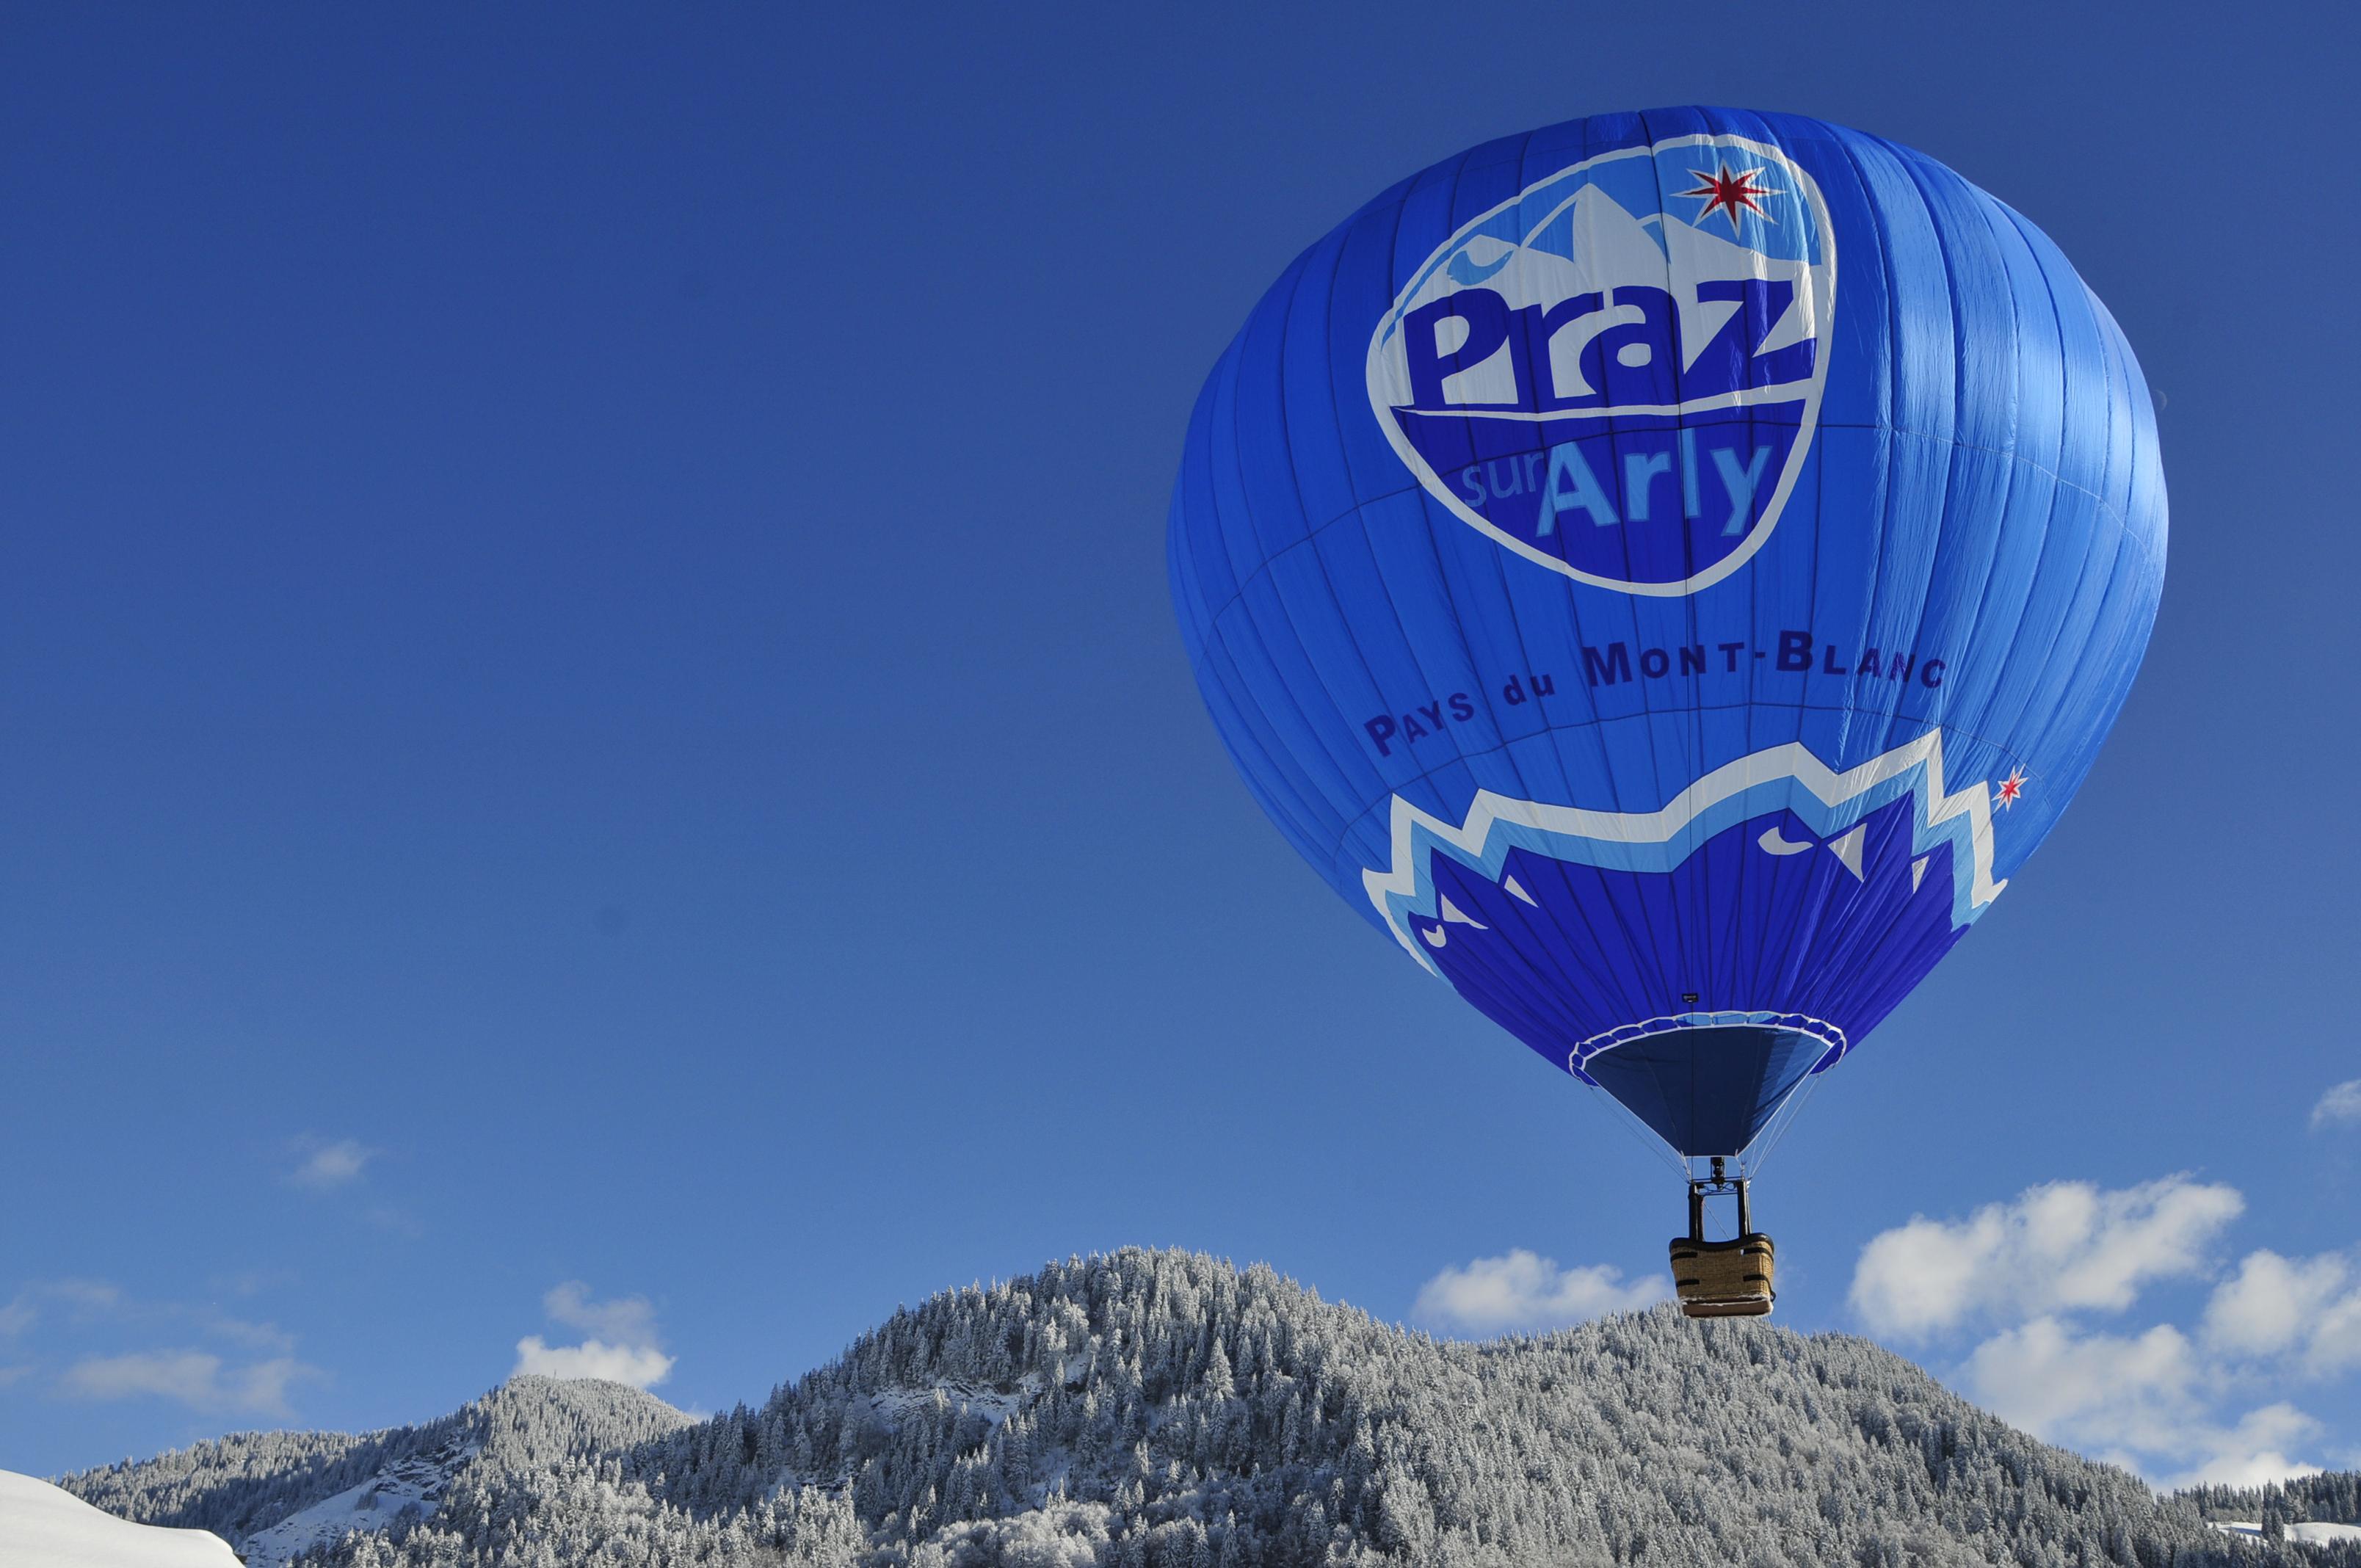 27 mes montgolfiades internationales office de tourisme de praz sur arly - Office de tourisme praz sur arly ...